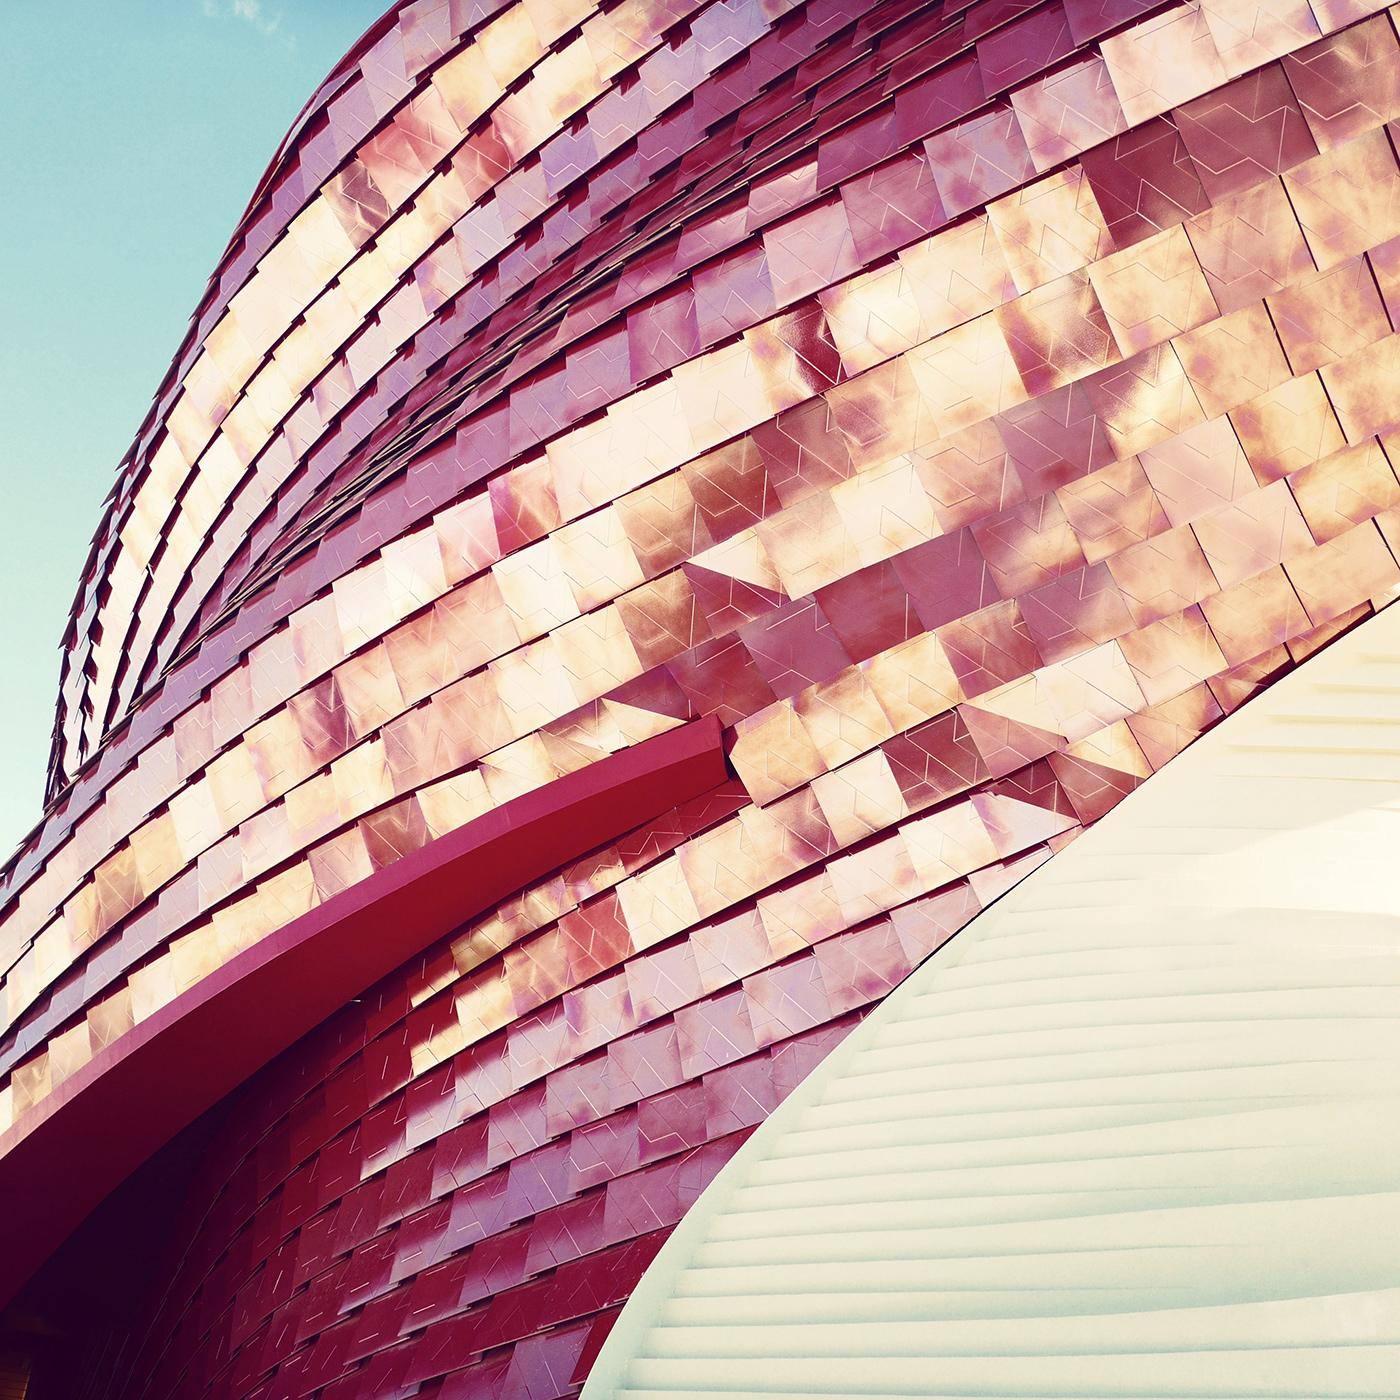 Vanke Pavilion Expo 2015 <br />Location: Milano, Italy <br />Architect: Daniel Libeskind